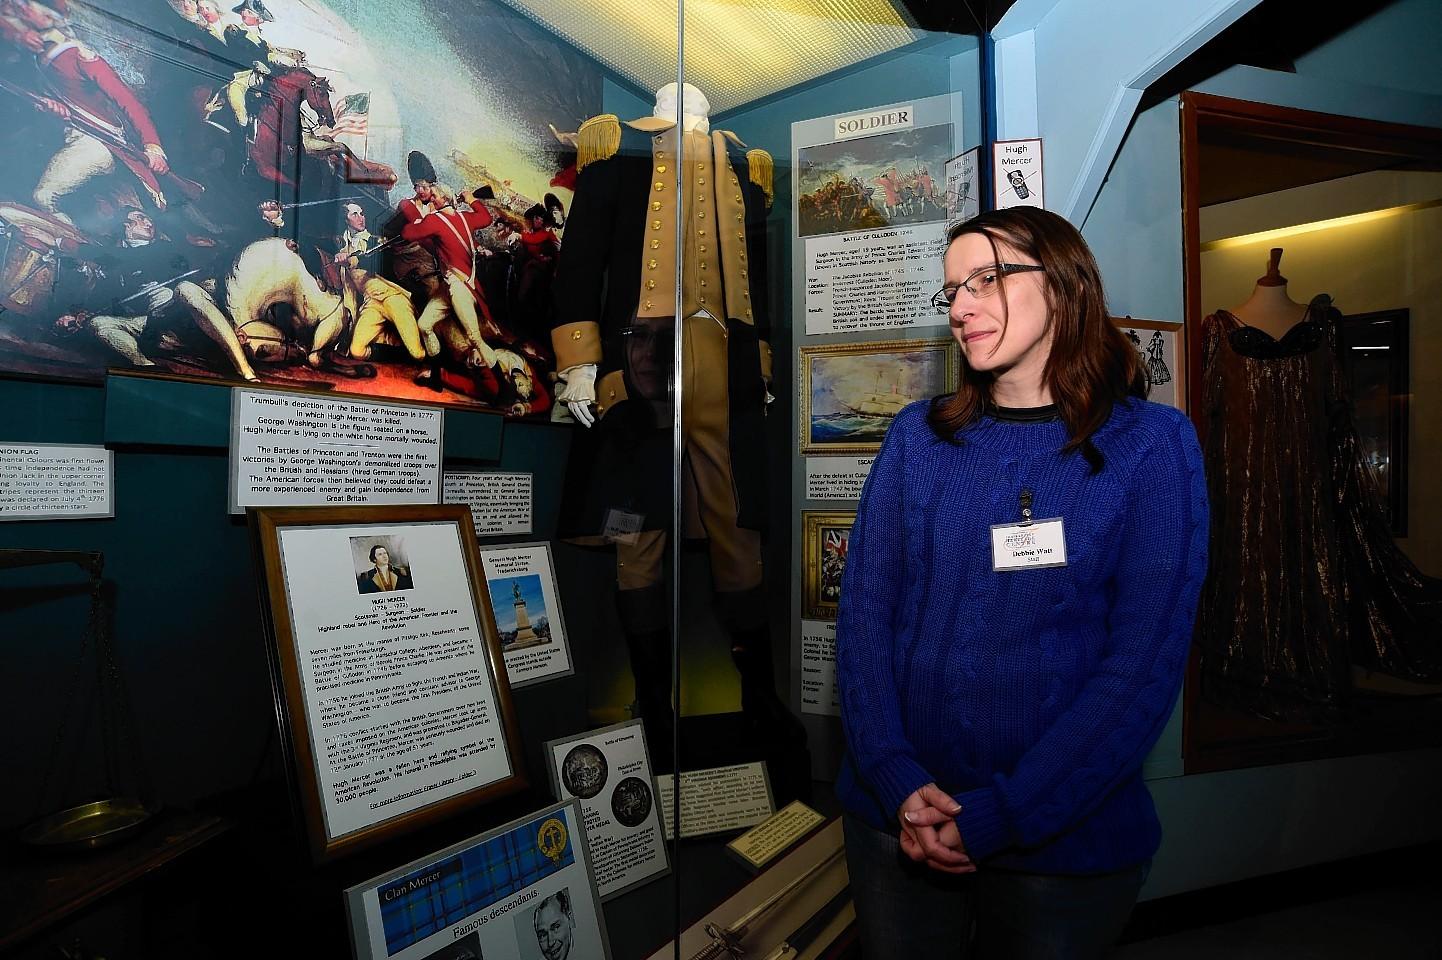 Fraserburgh Heritage Centre guide Debbie Watt at the General Hugh Mercer exhibition